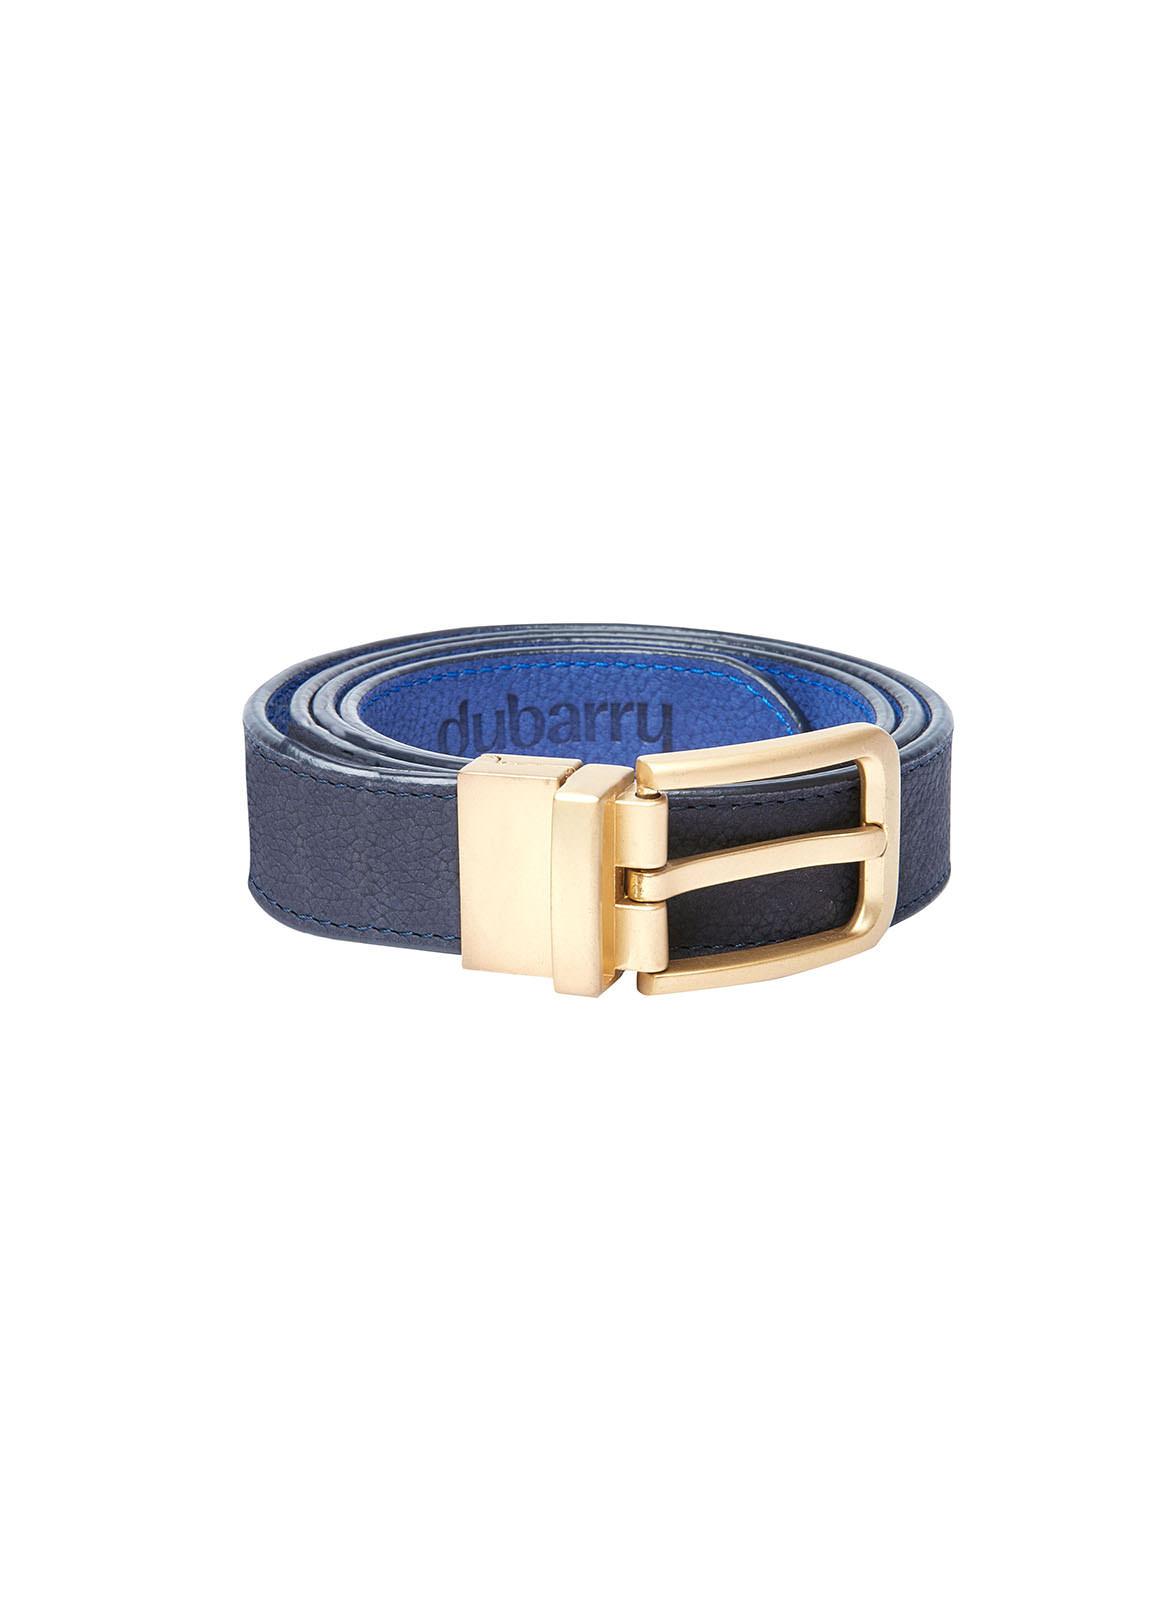 Foynes Leather Belt  - Navy